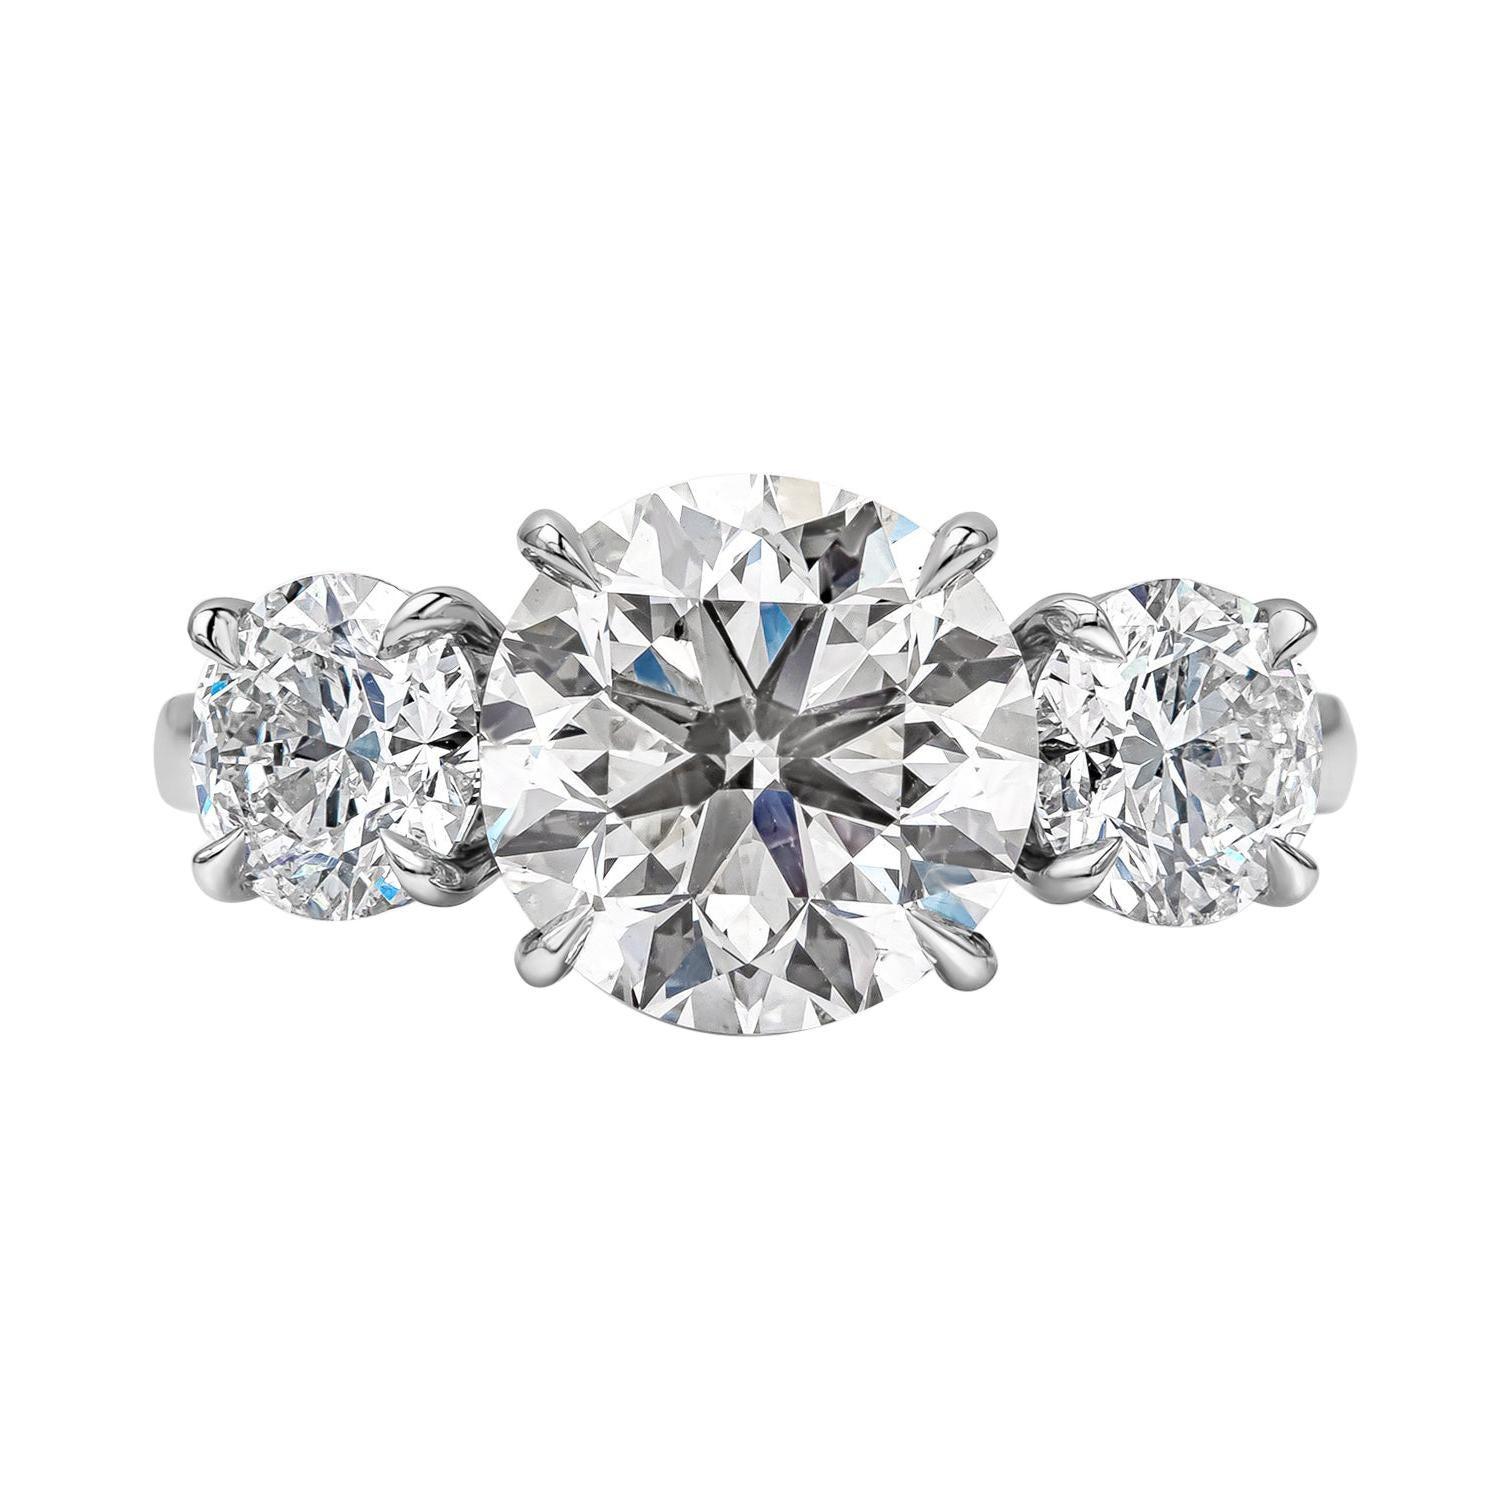 GIA Certified 3.01 Carat Round Diamond Three-Stone Engagement Ring